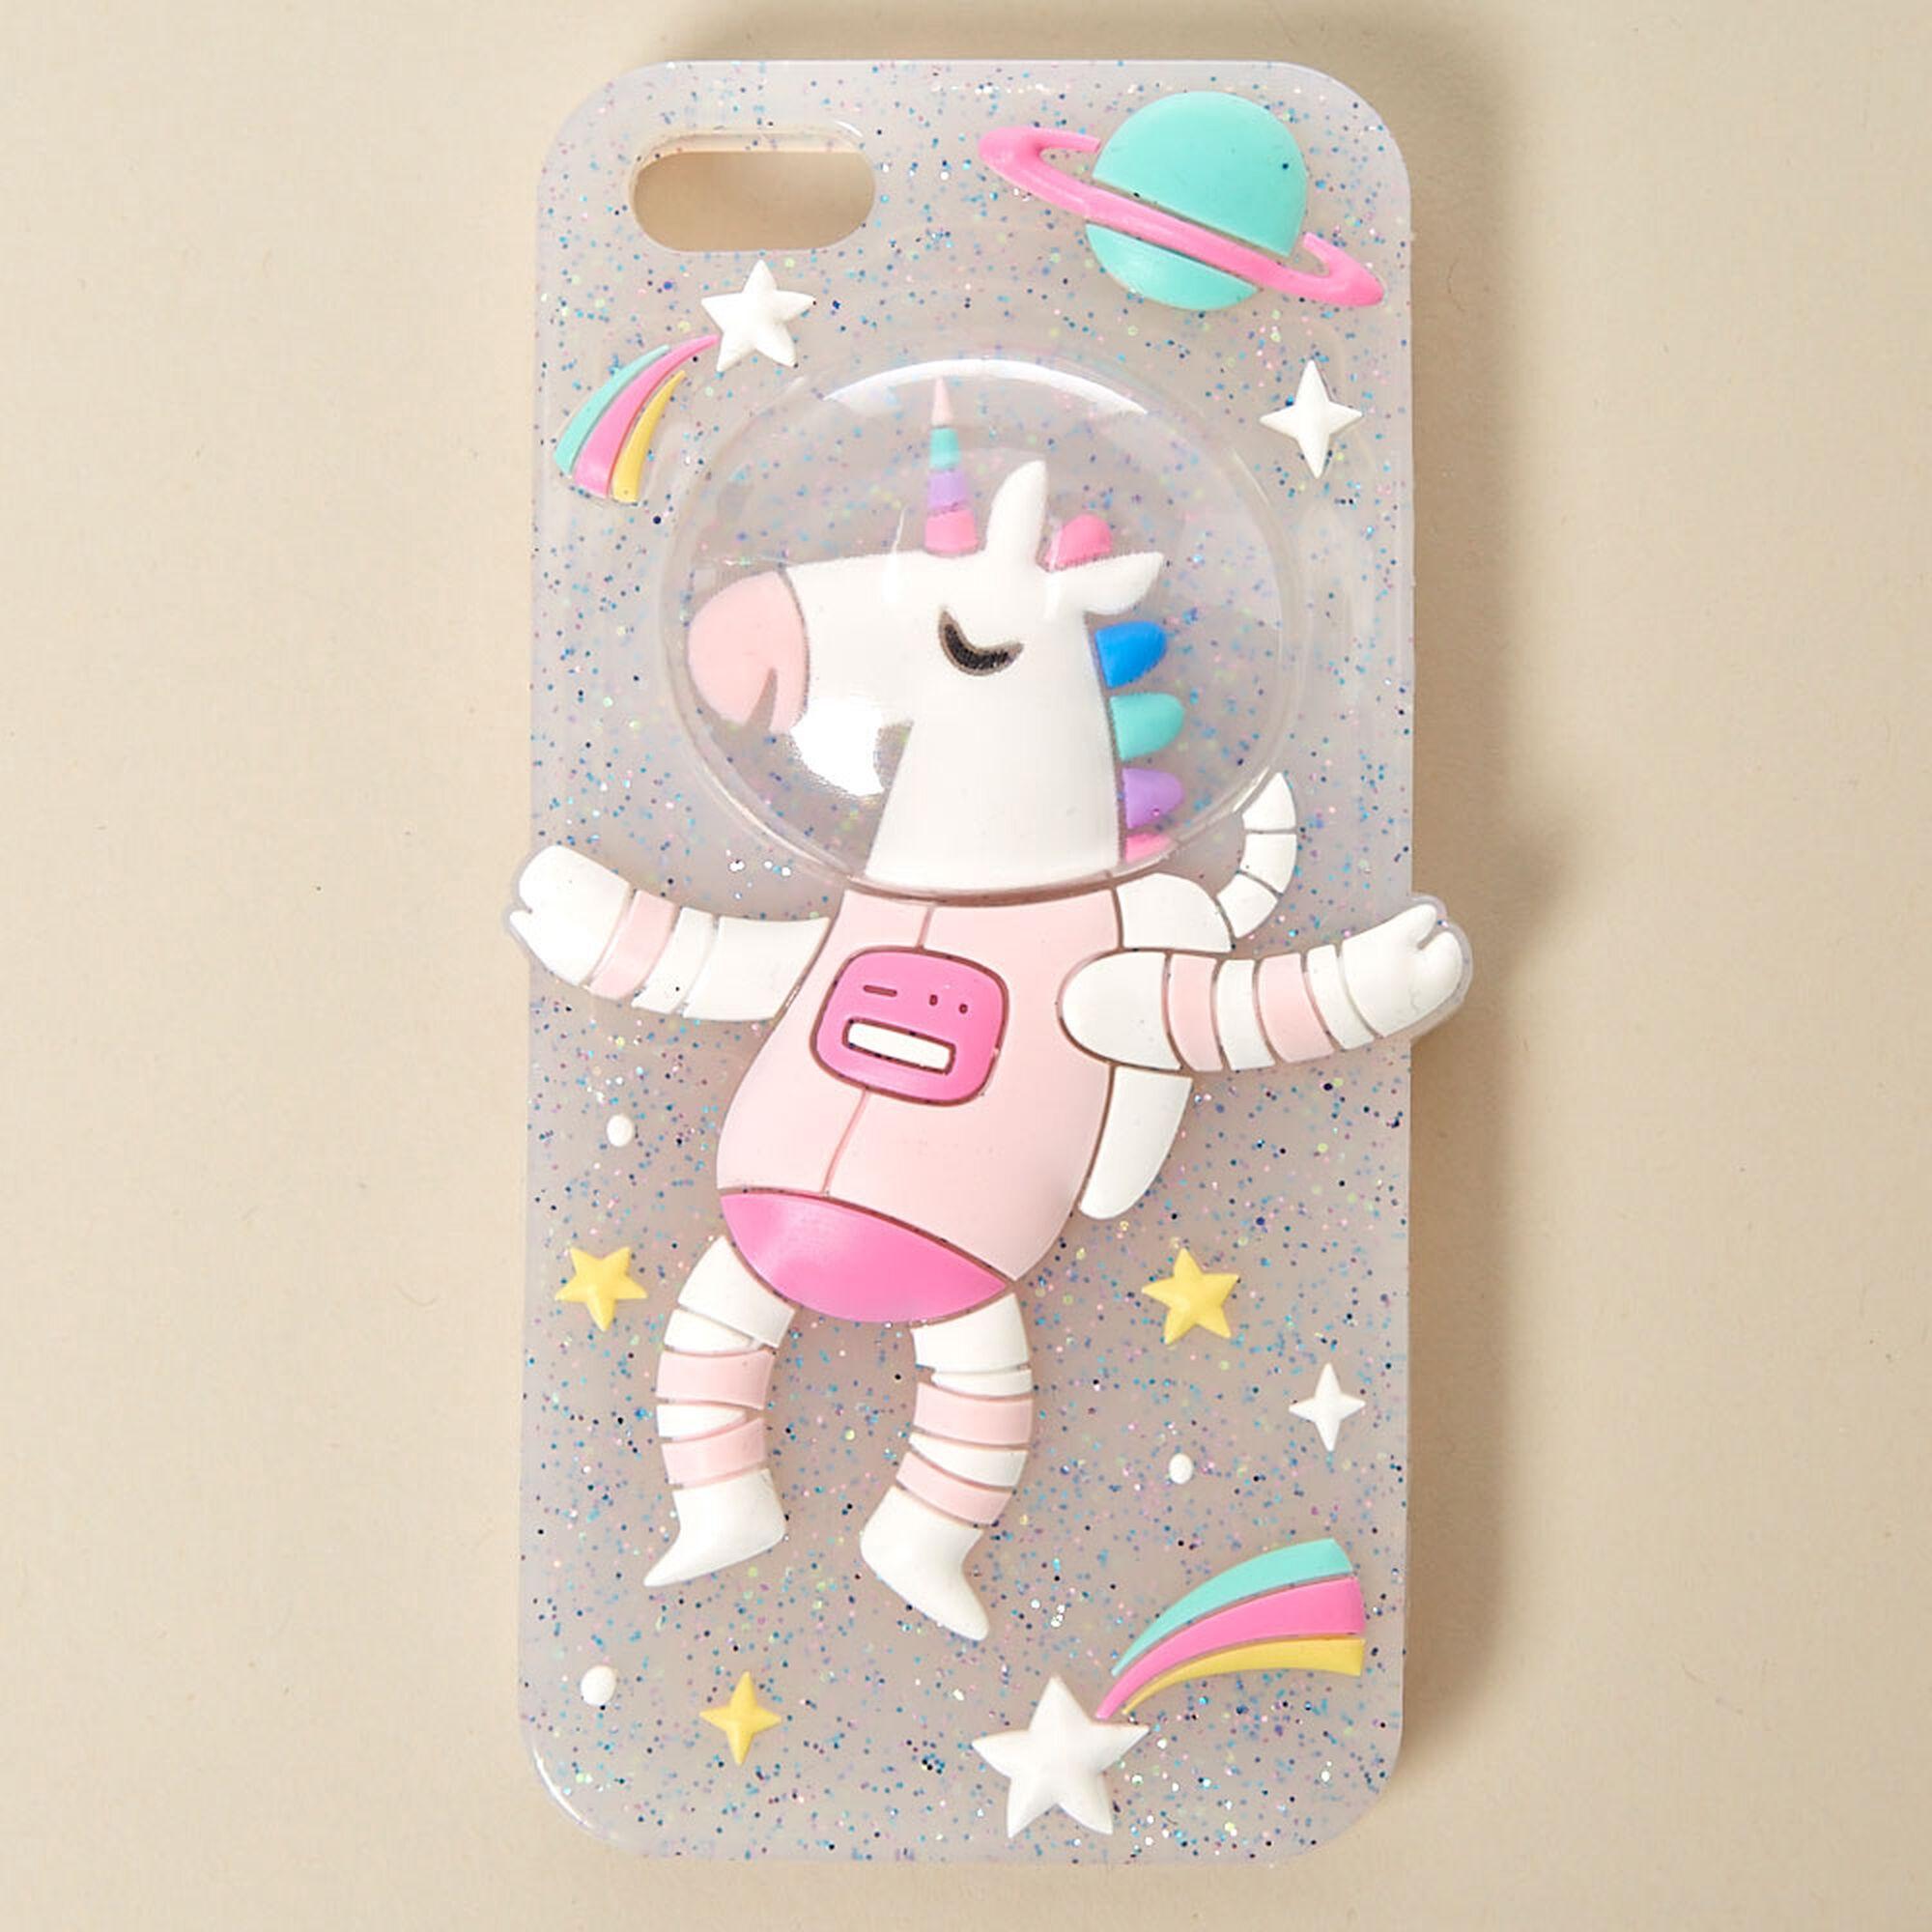 Squishy Unicorn Phone Case : Space Unicorn Phone Case Claire s US